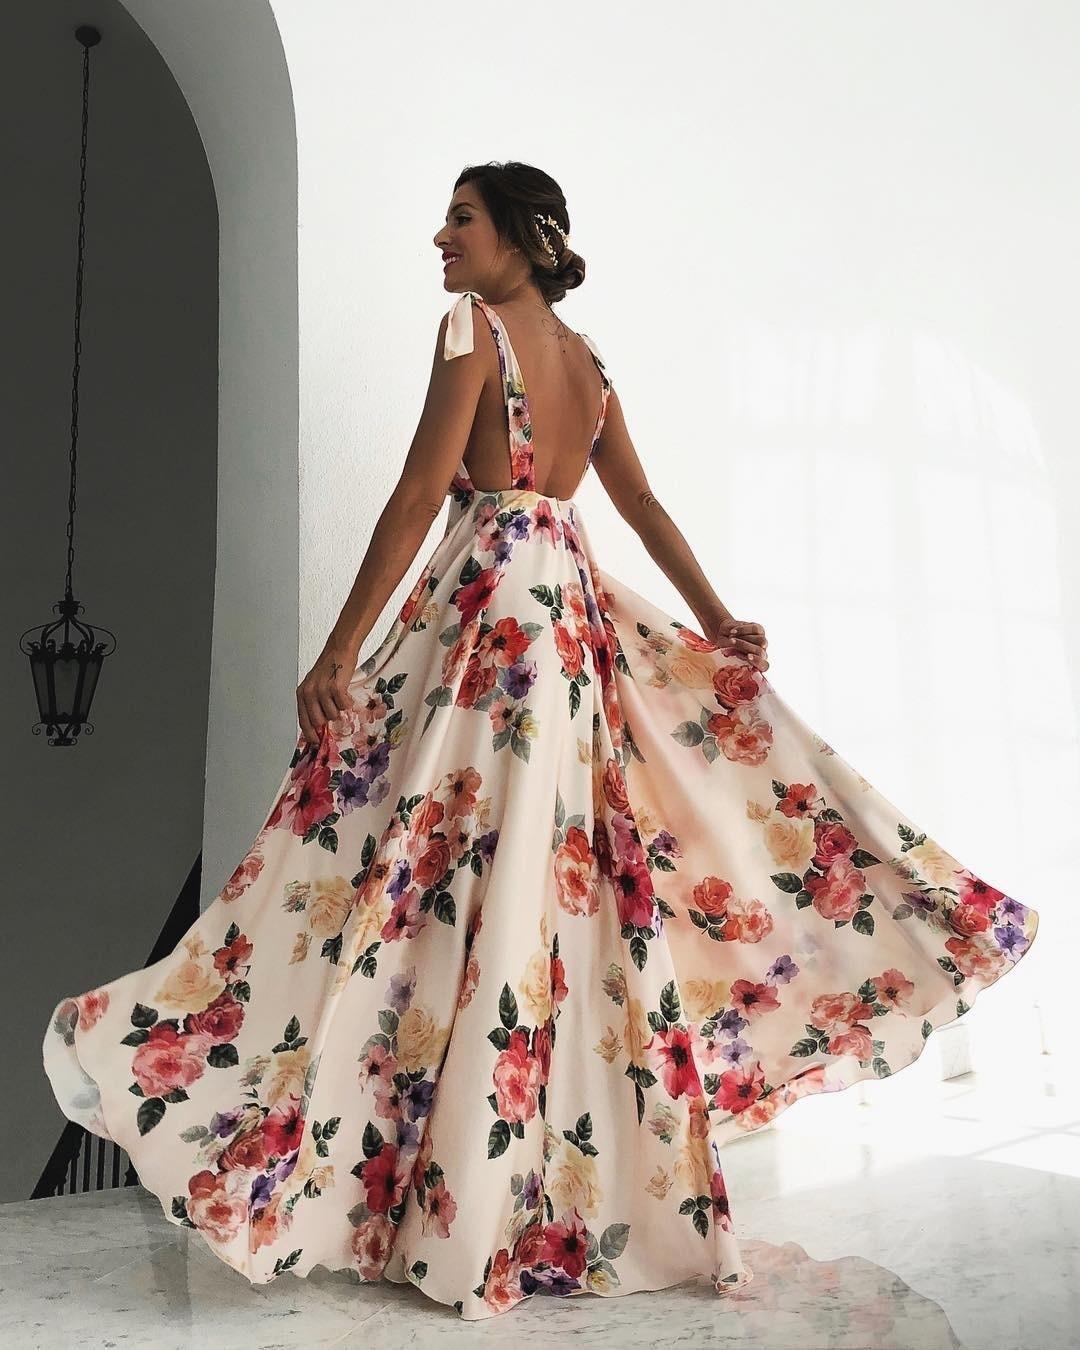 cb3fd36ba53 Loneyshow 2018 Summer Dress Flower Printing Sleeveless maxi Dress ...